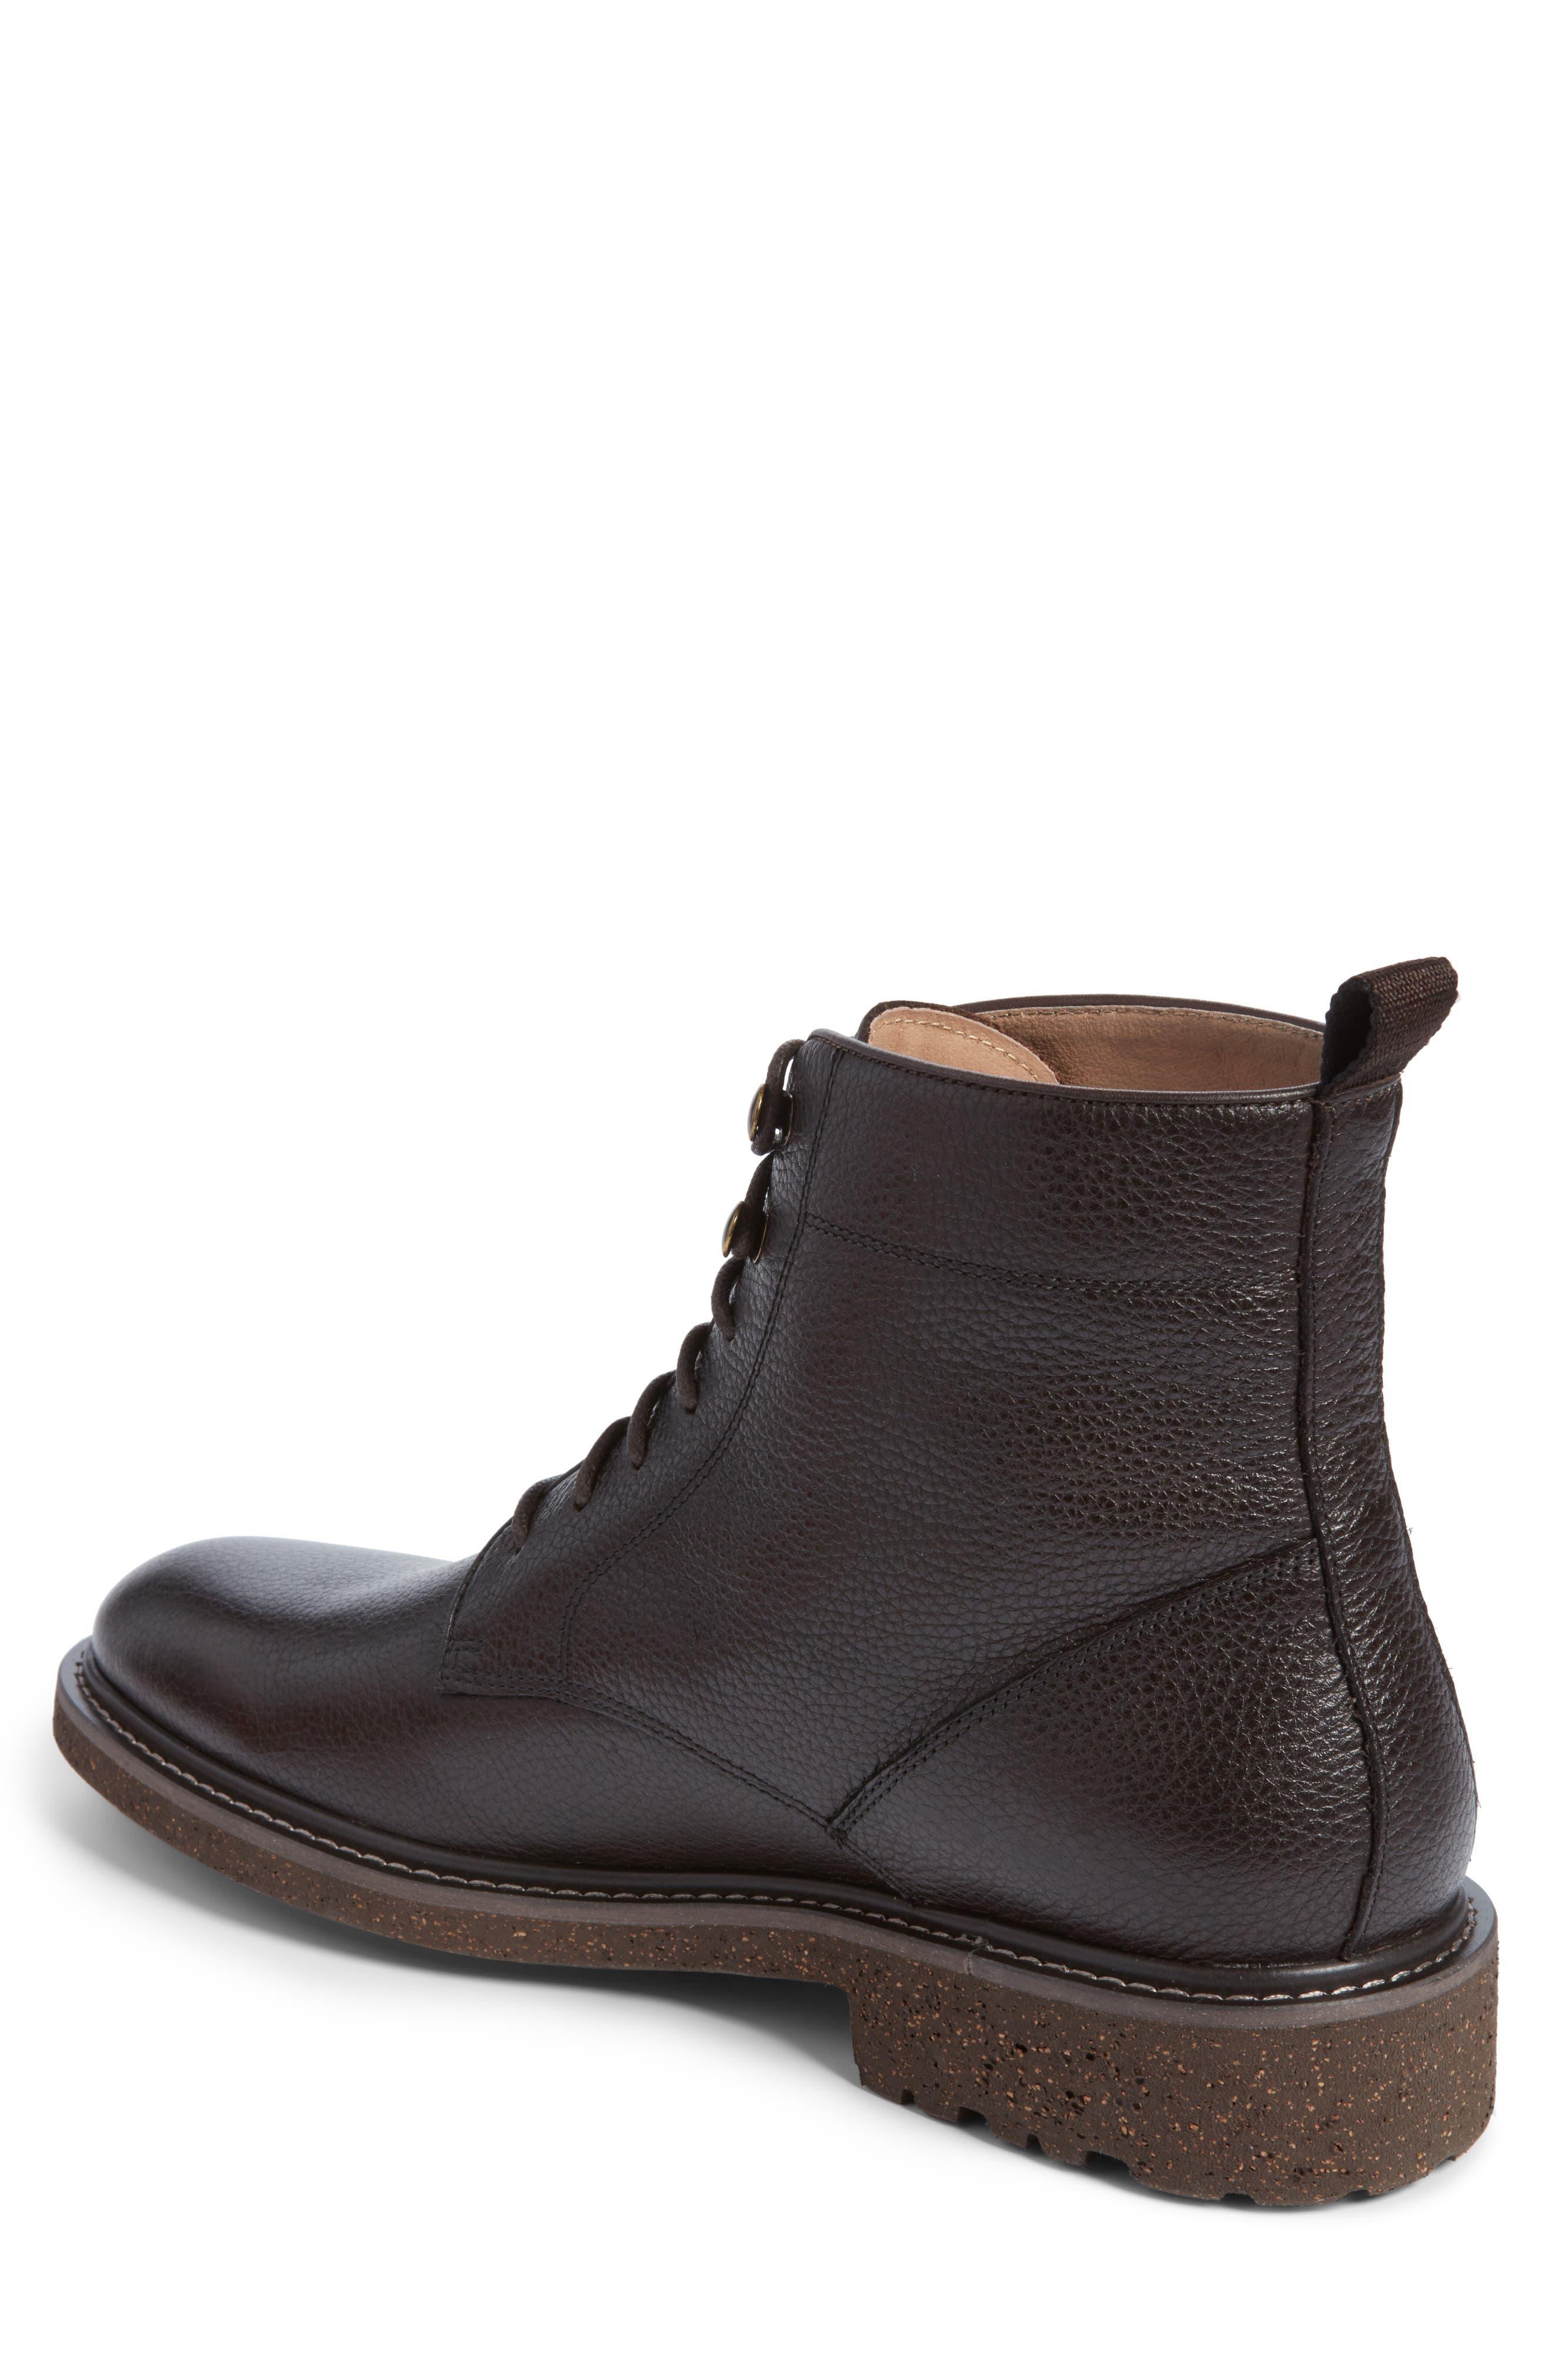 Trenton Plain Toe Boot,                             Alternate thumbnail 2, color,                             Chocolate Leather